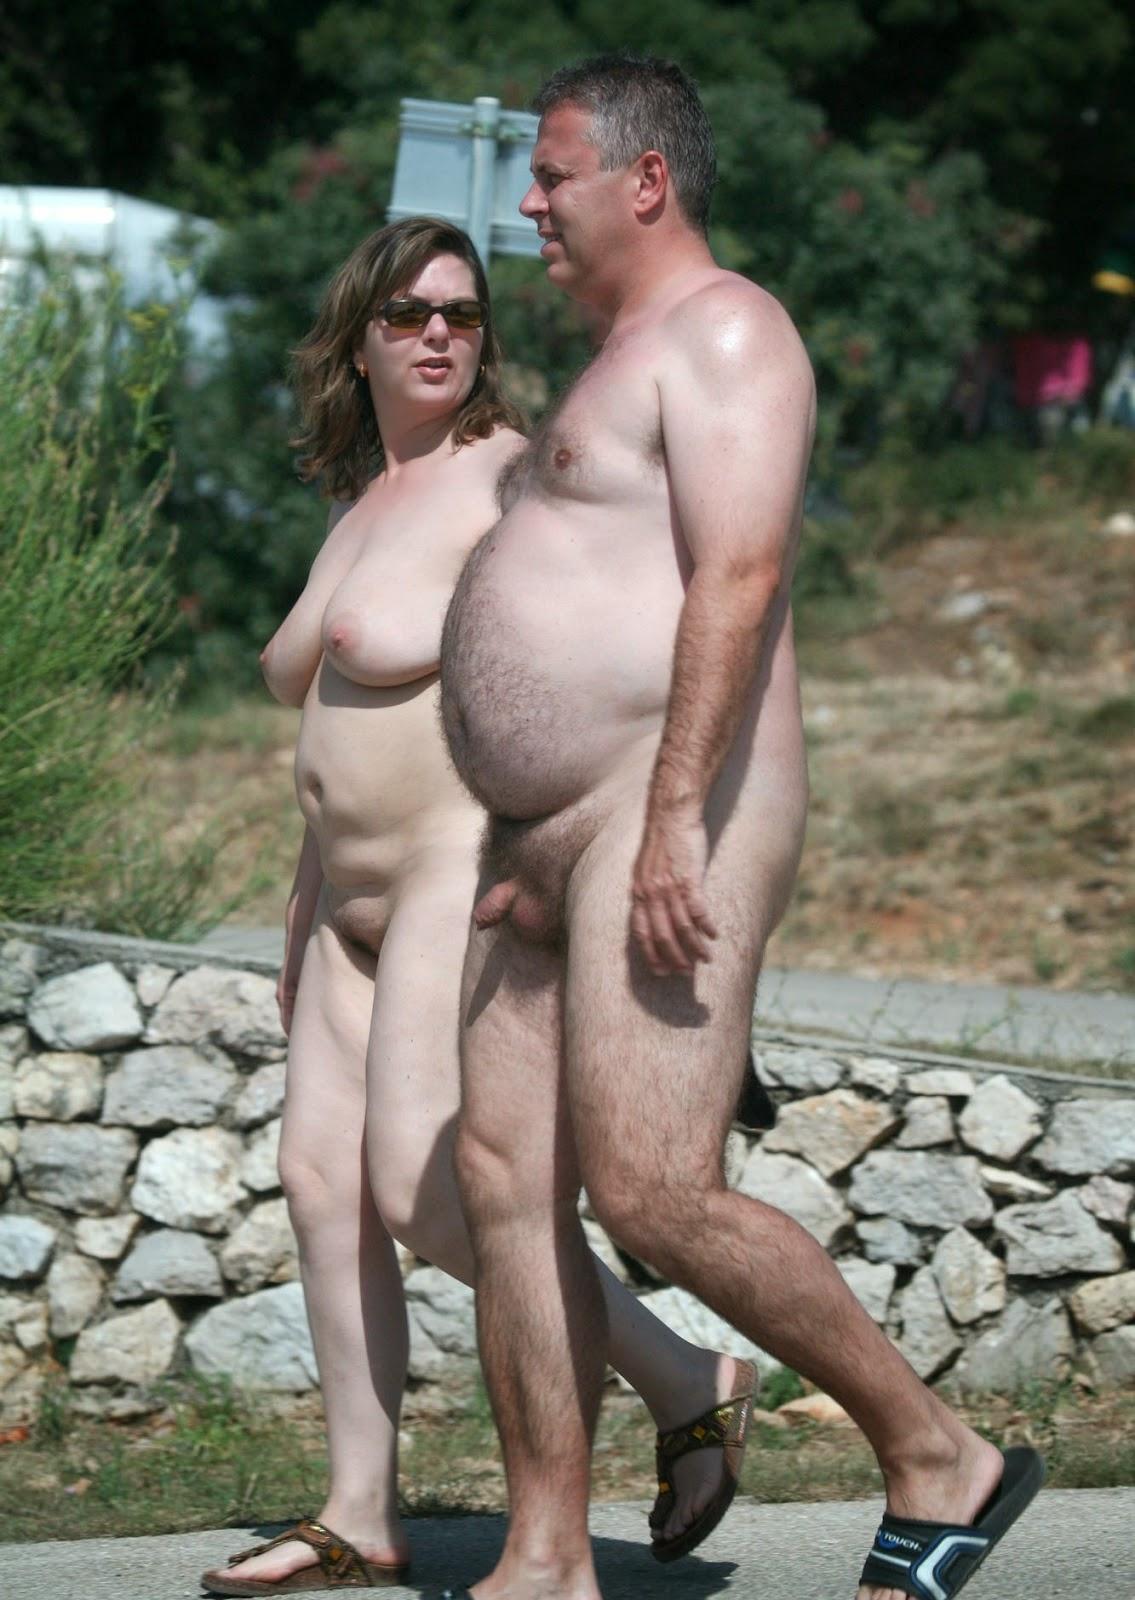 Brazilian gay nudist camps